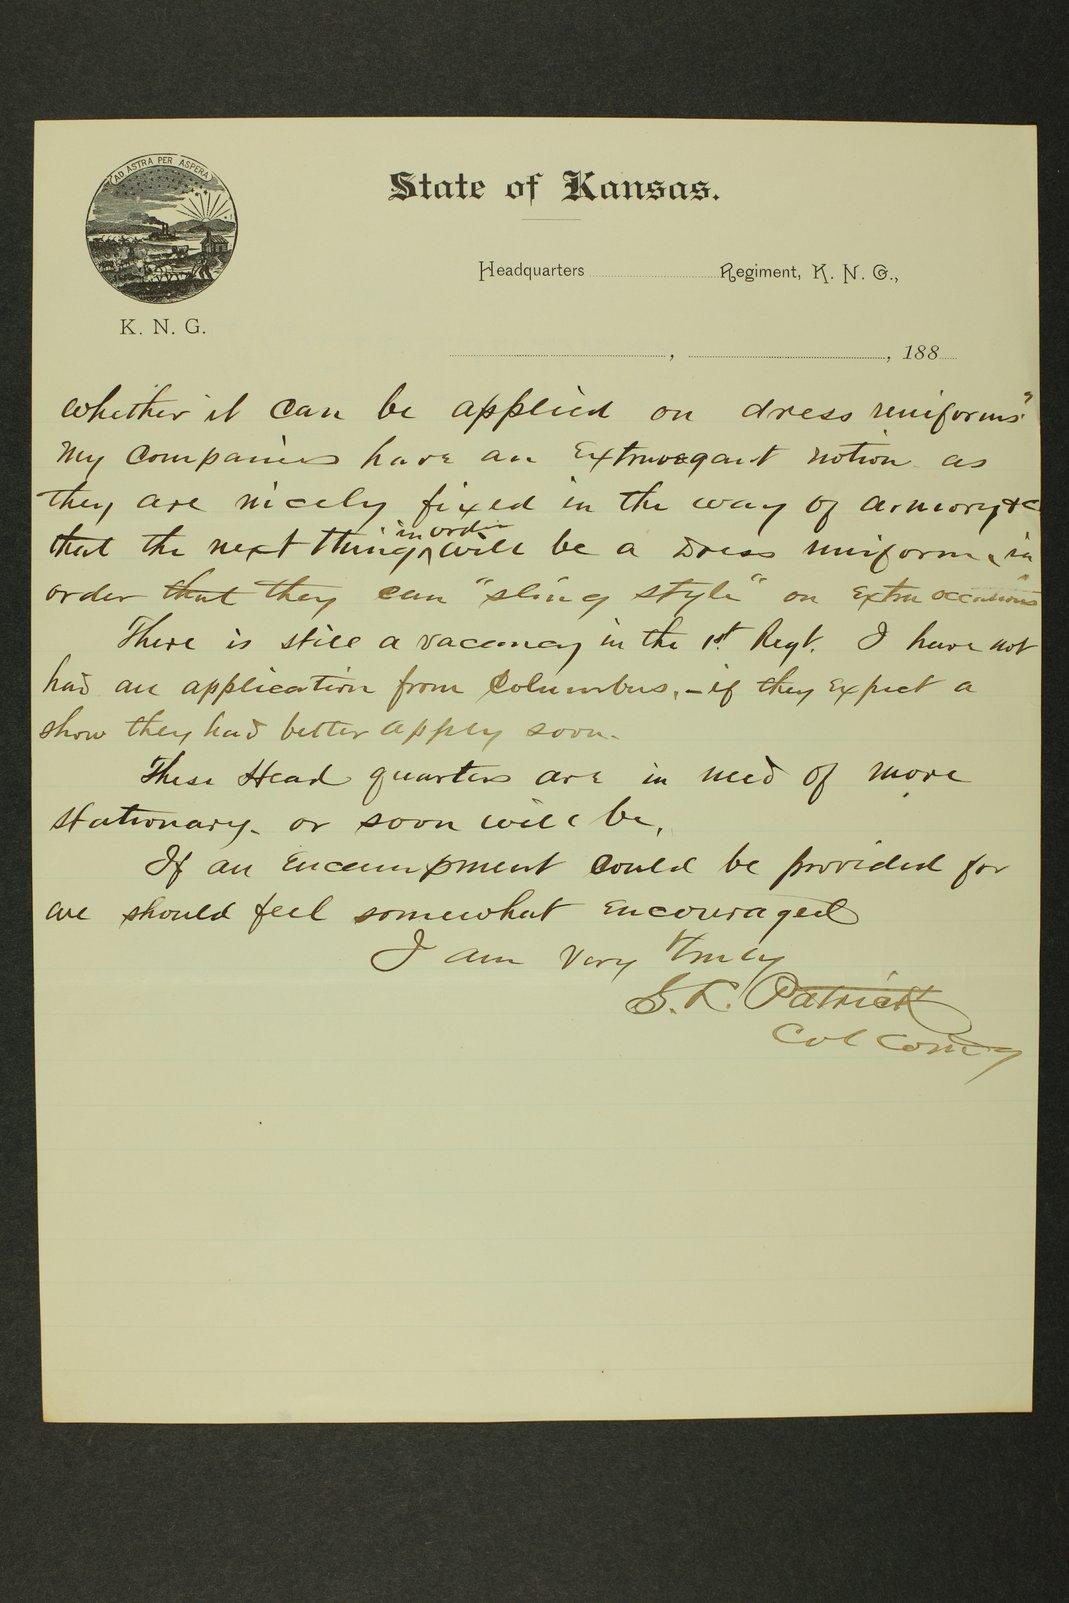 Kansas Adjutant General miscellaneous correspondence - 11